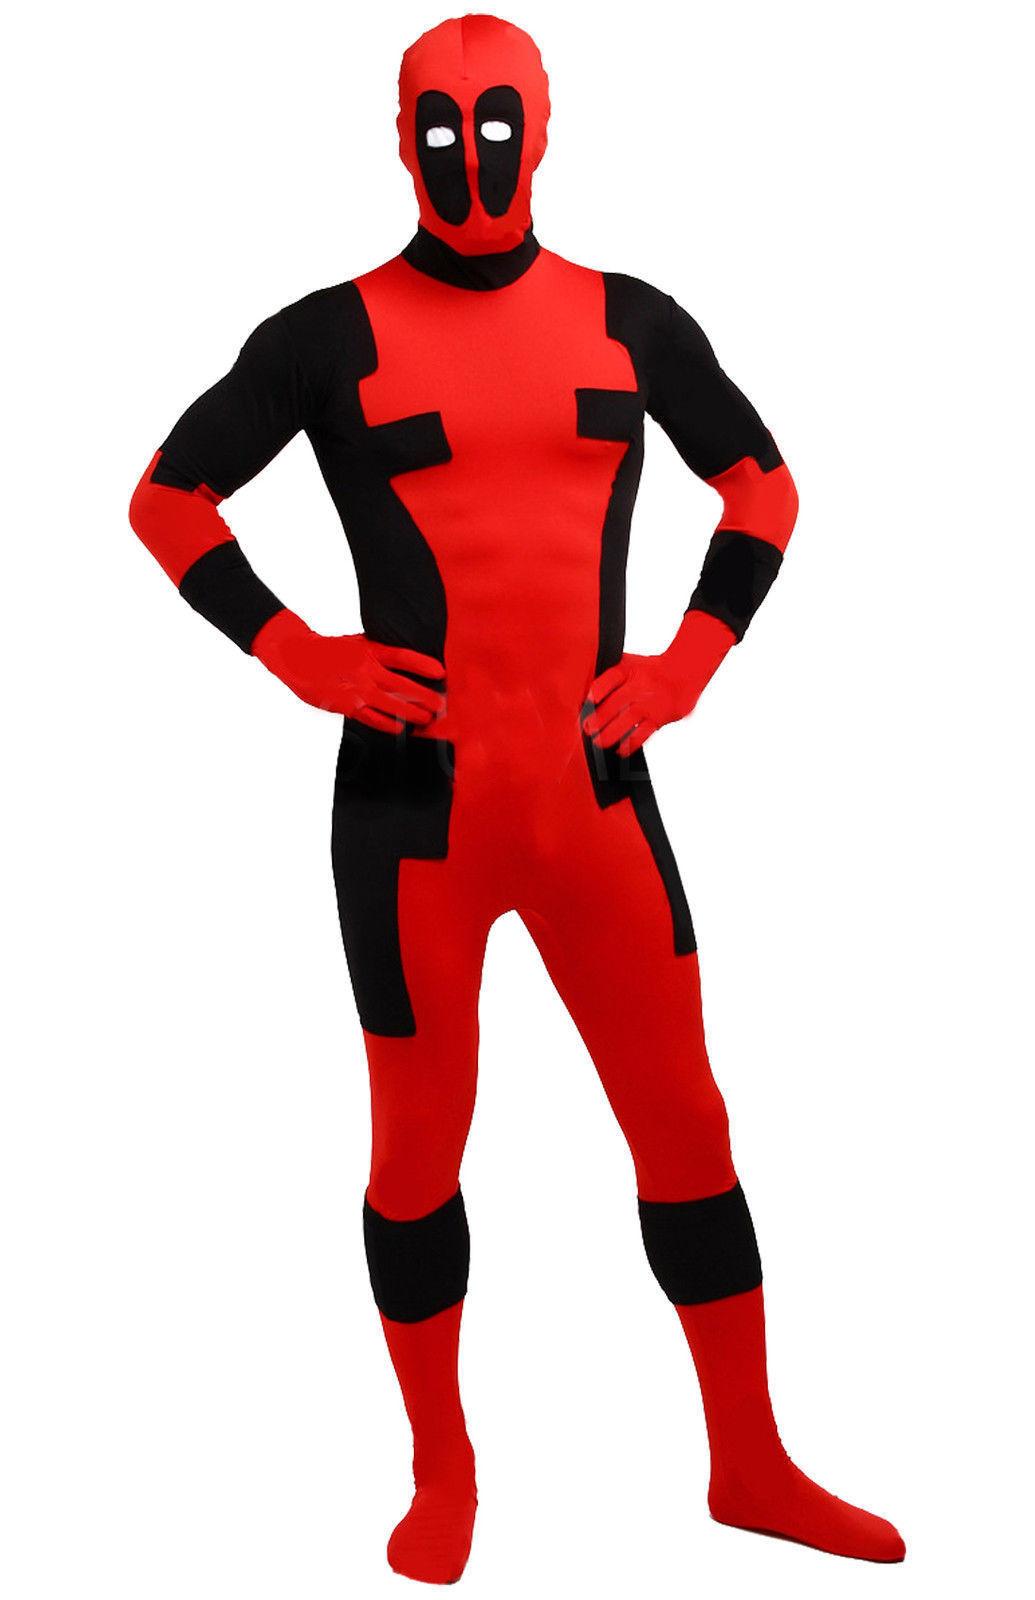 Superhero X-men Deadpool Cosplay Bodysuit Costume Jumsuit